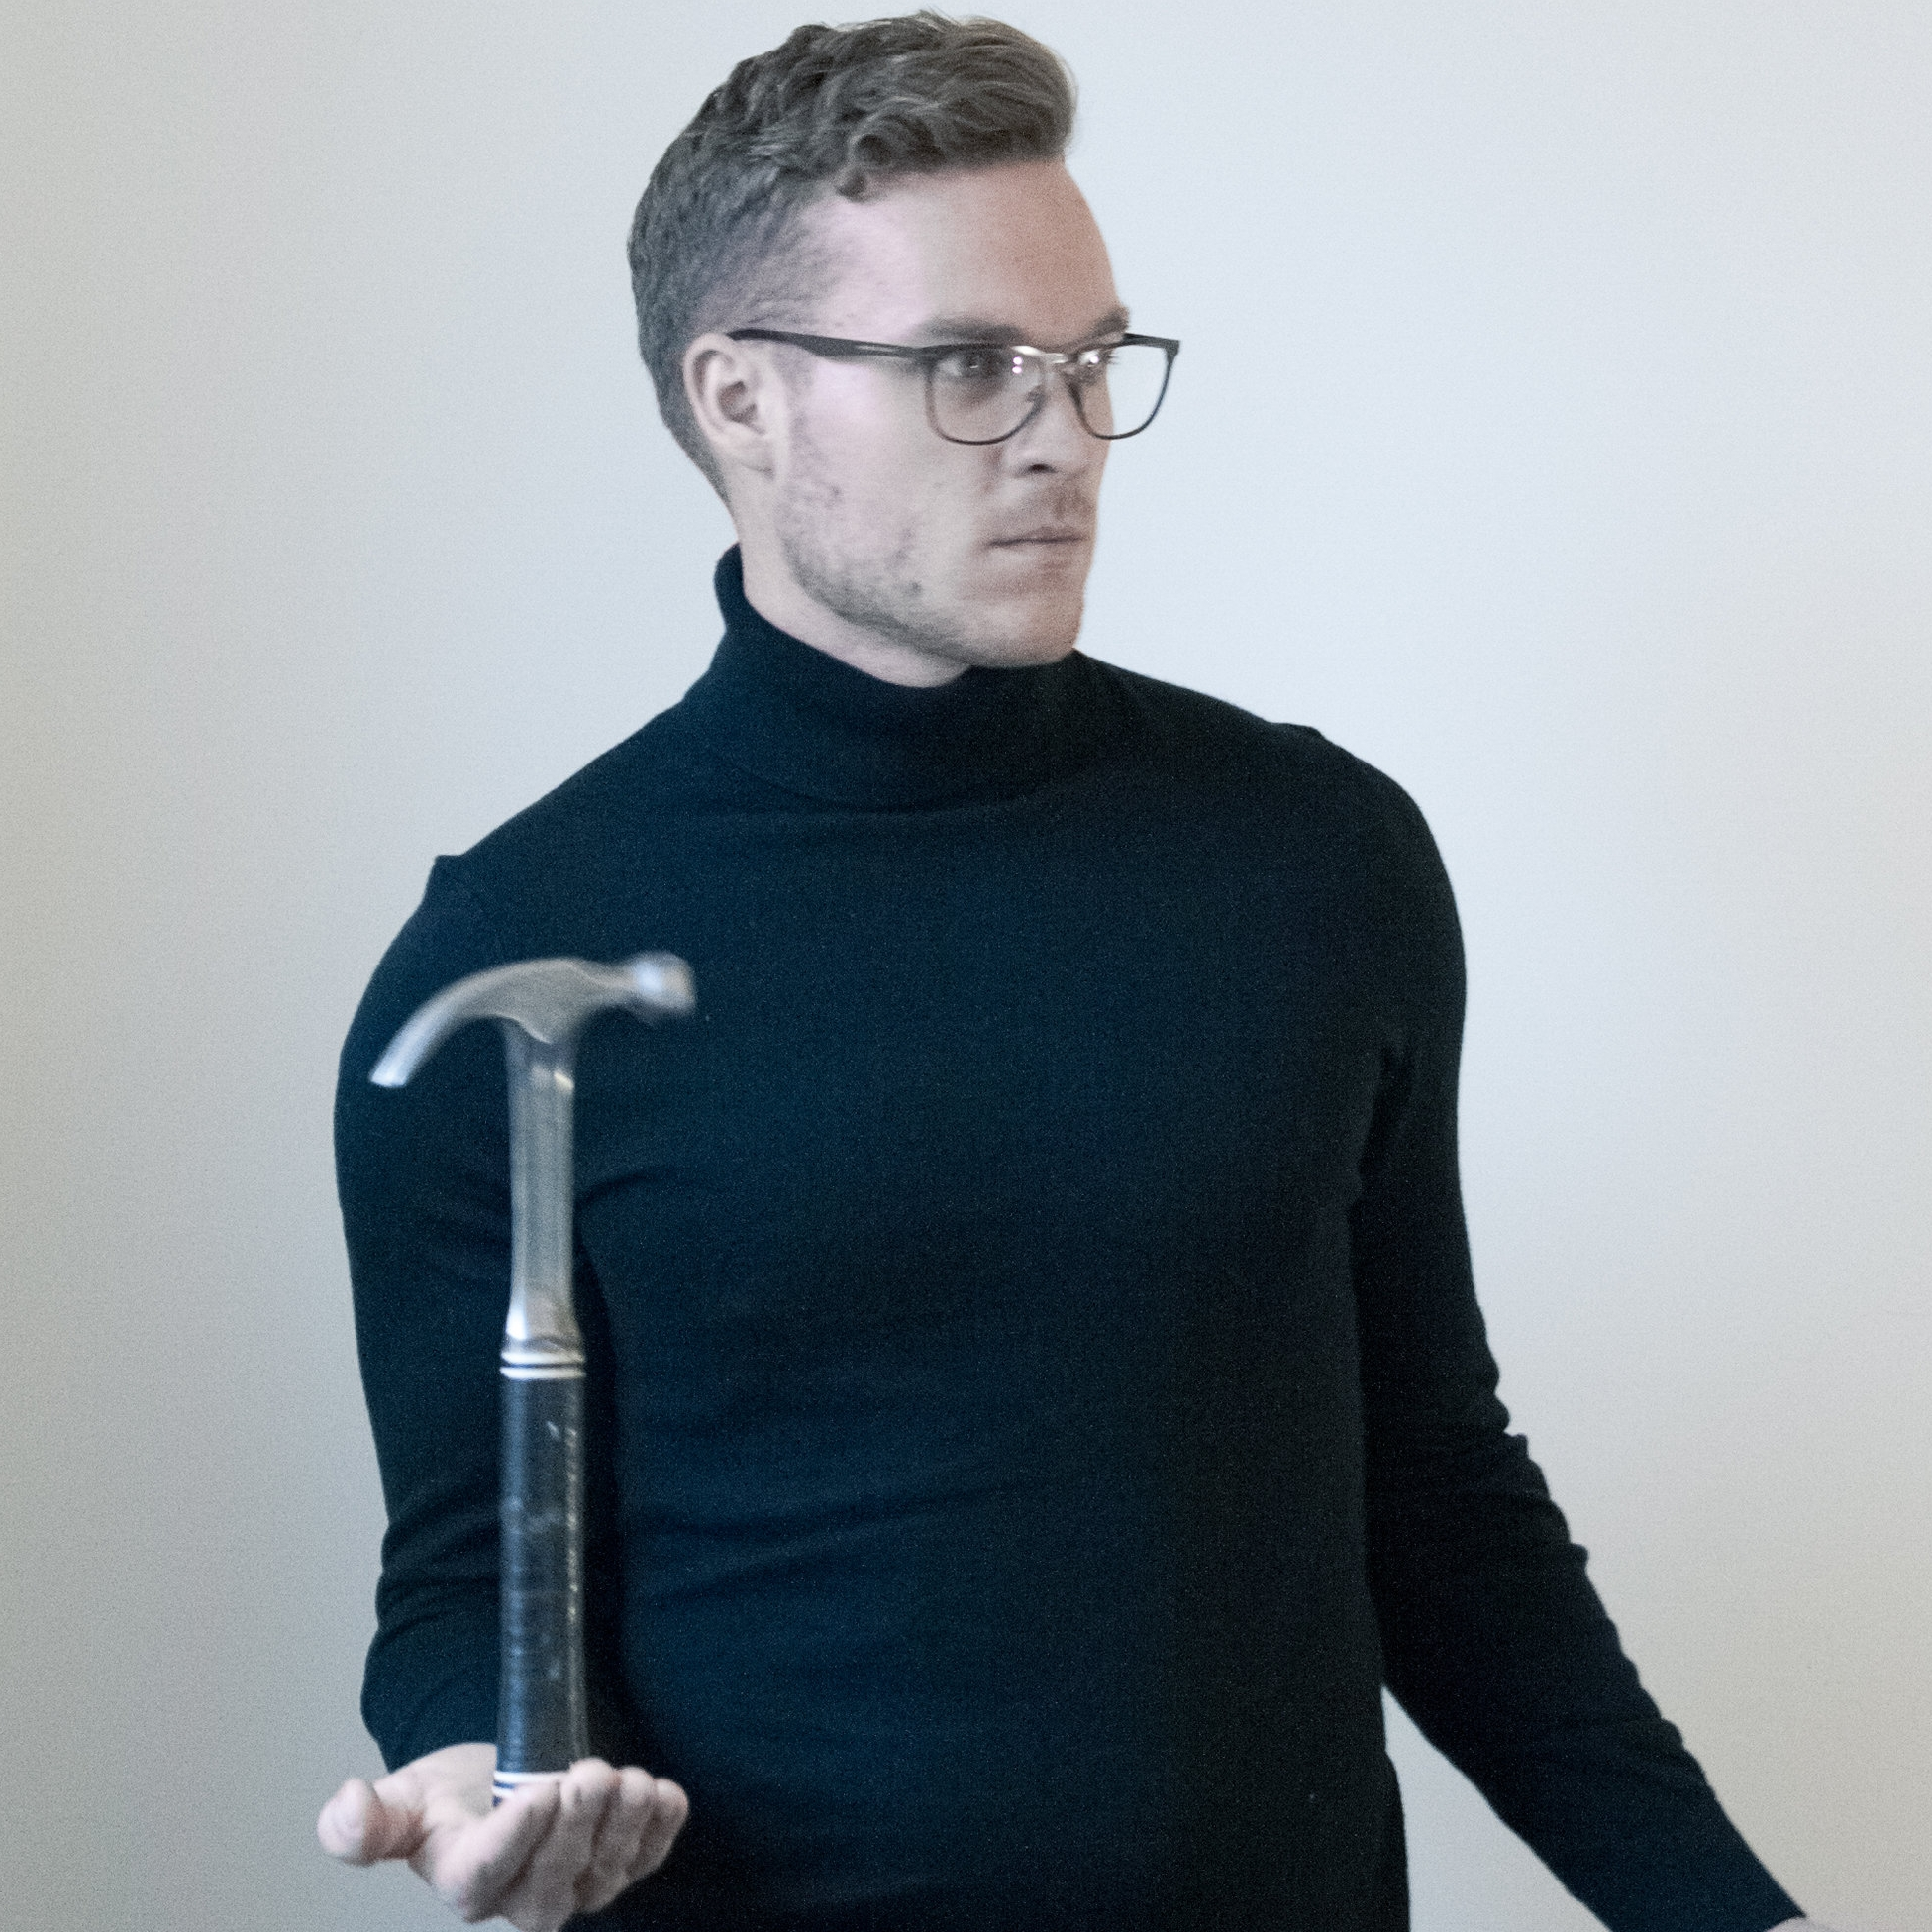 Håkon Lundby   Teknisk tegner, BIM koordinator  Snikker  tlf: 984 84 109   hakon@ram-arkitektur.no